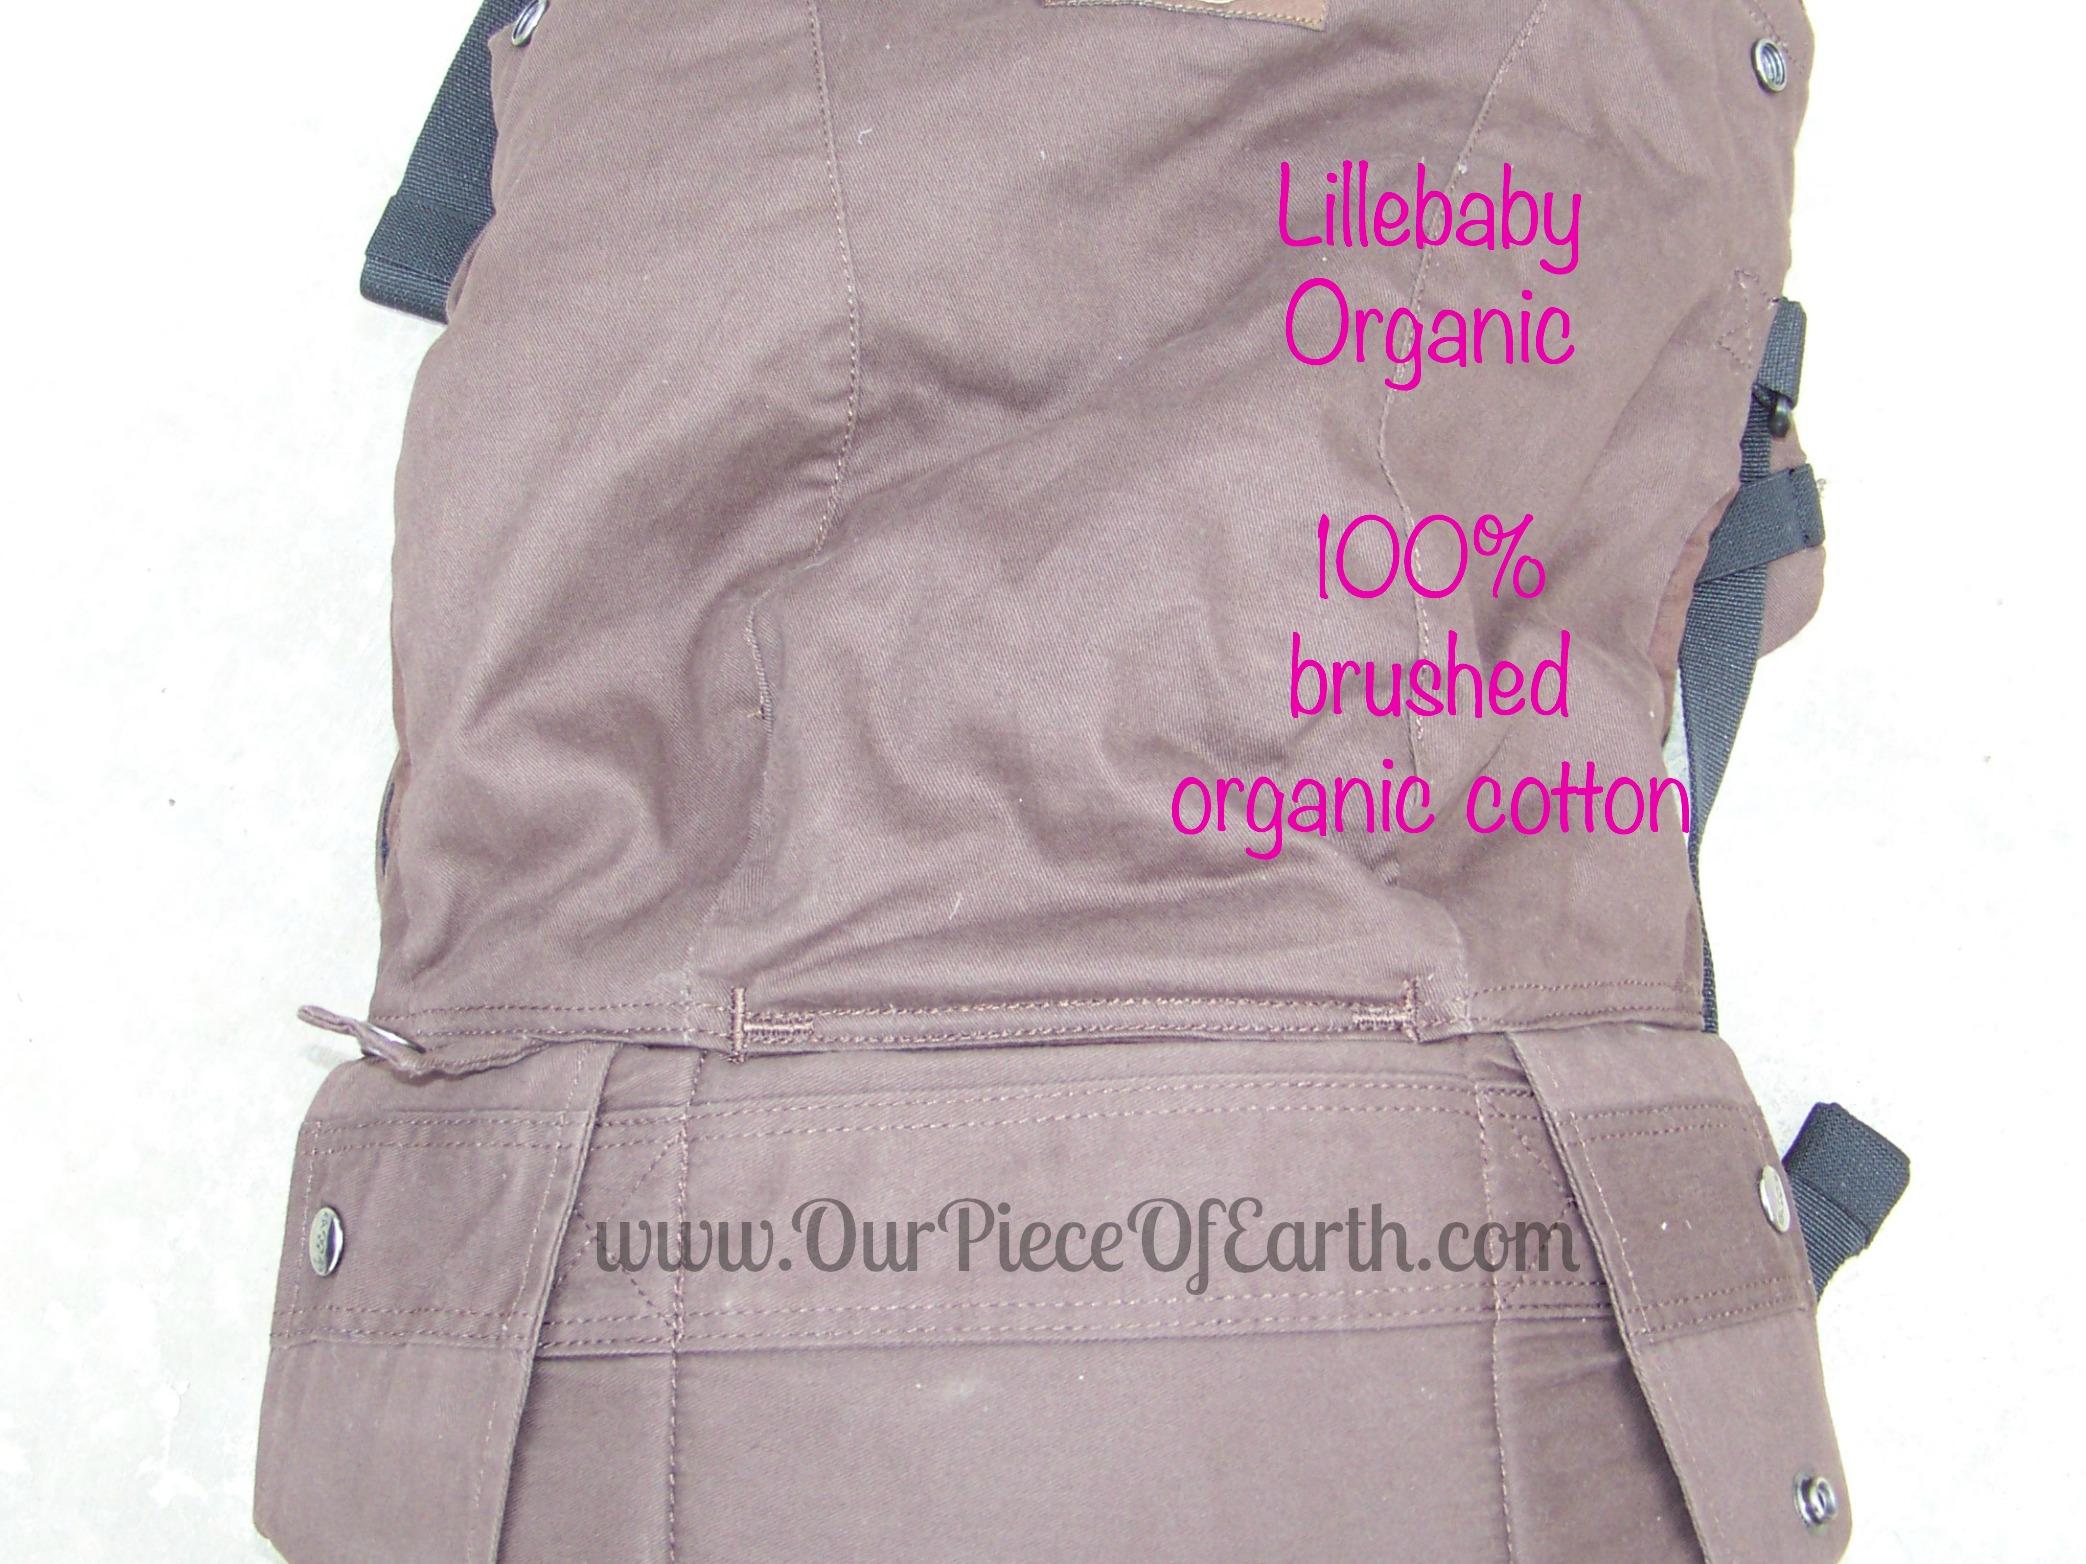 Lillebaby Organic